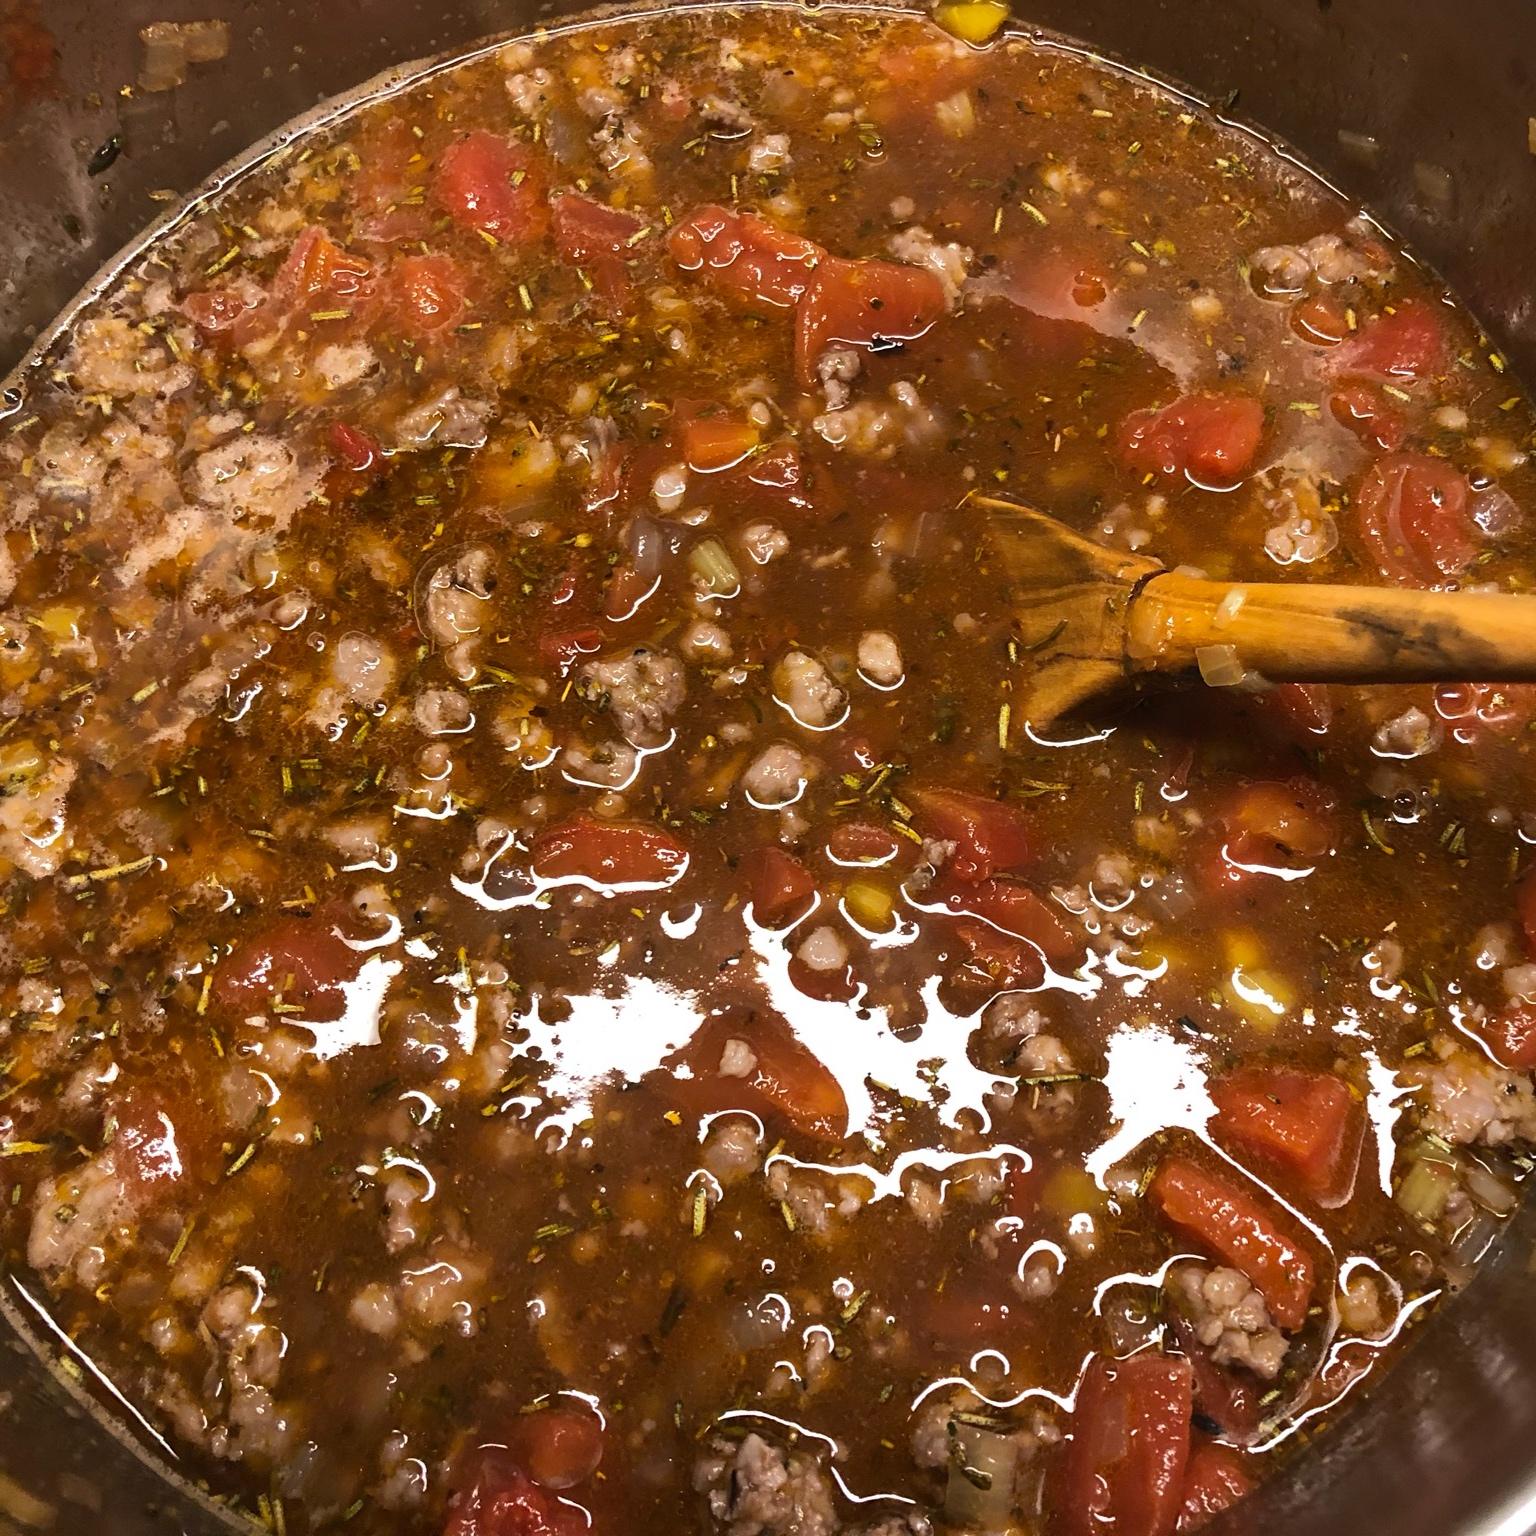 Cooking the ragu